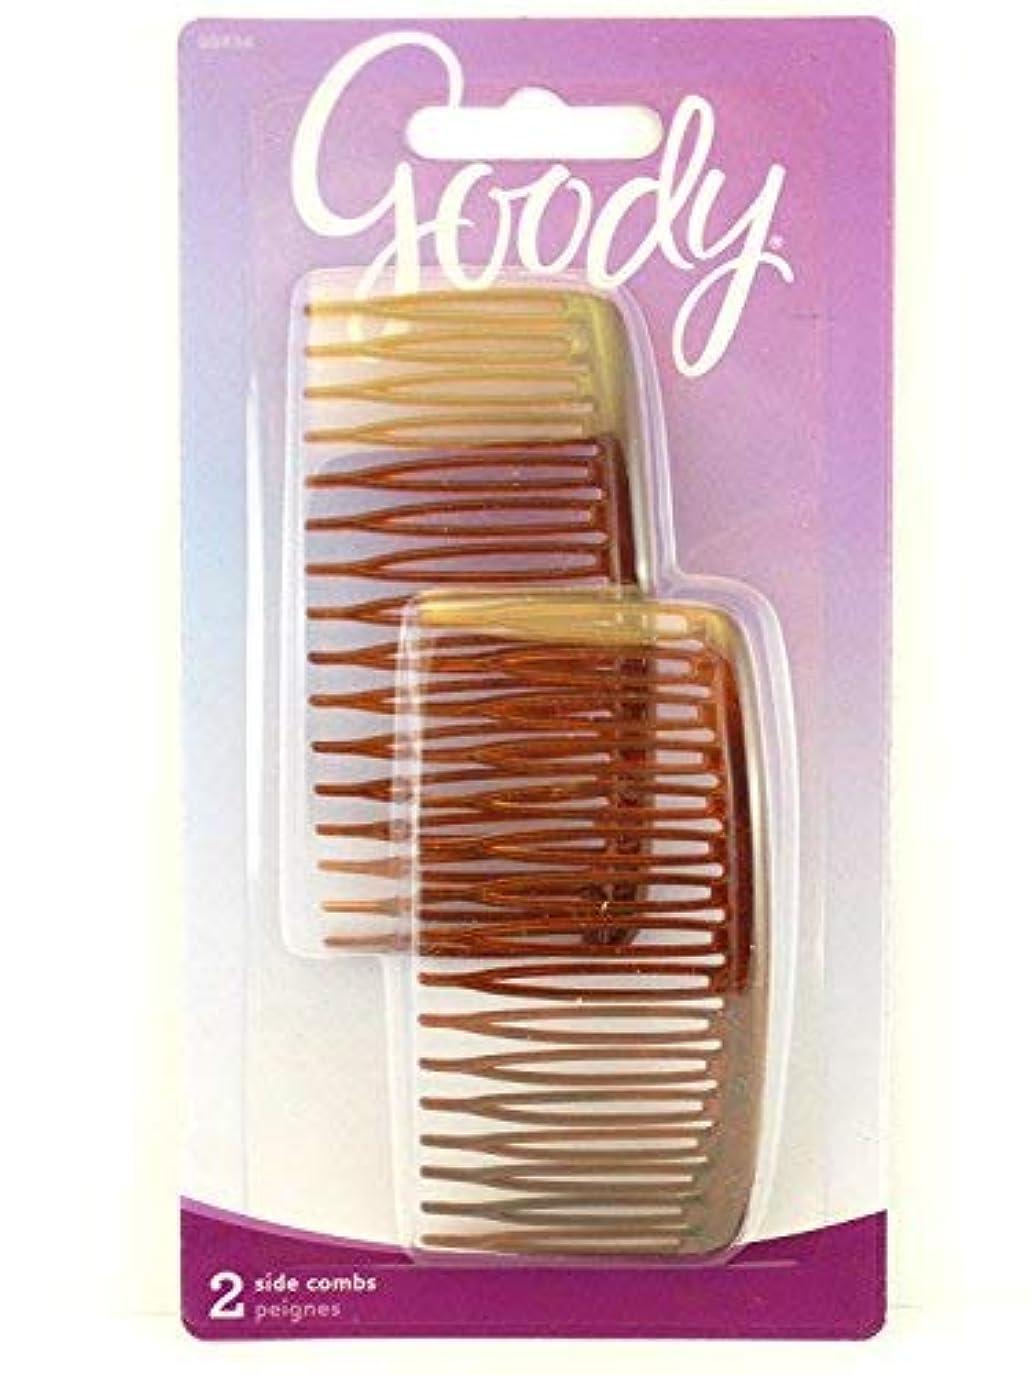 Goody WoMens Classics Mock Tort Comb, Side, 0.51 Inch, 2 Count [並行輸入品]